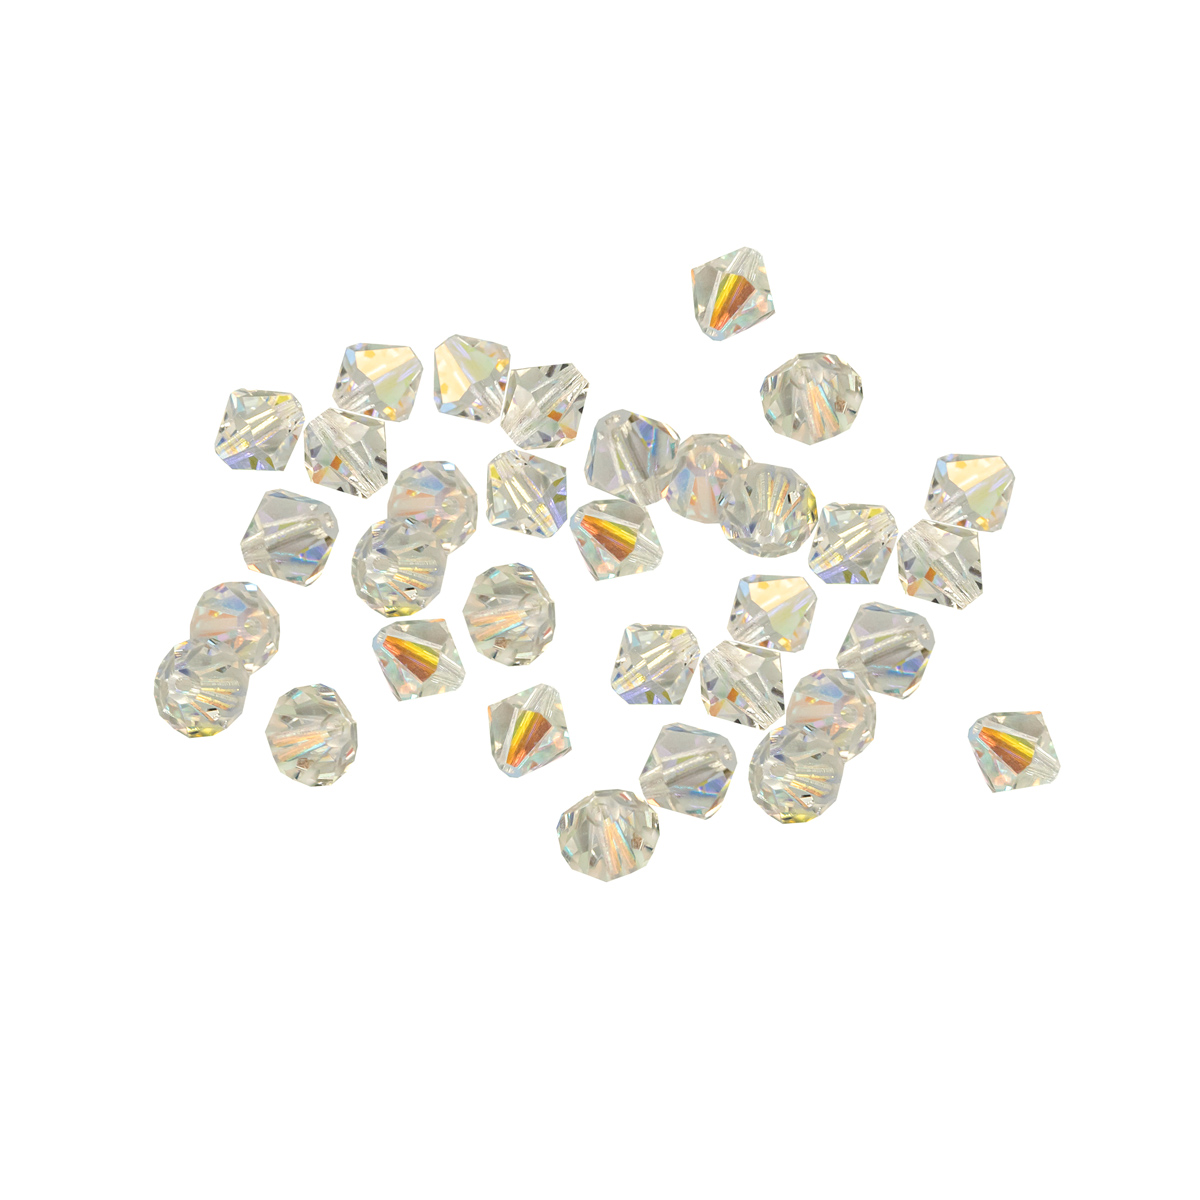 451-69-302 Бусины Биконус Crystal AB 8x8мм. 30 шт. Preciosa